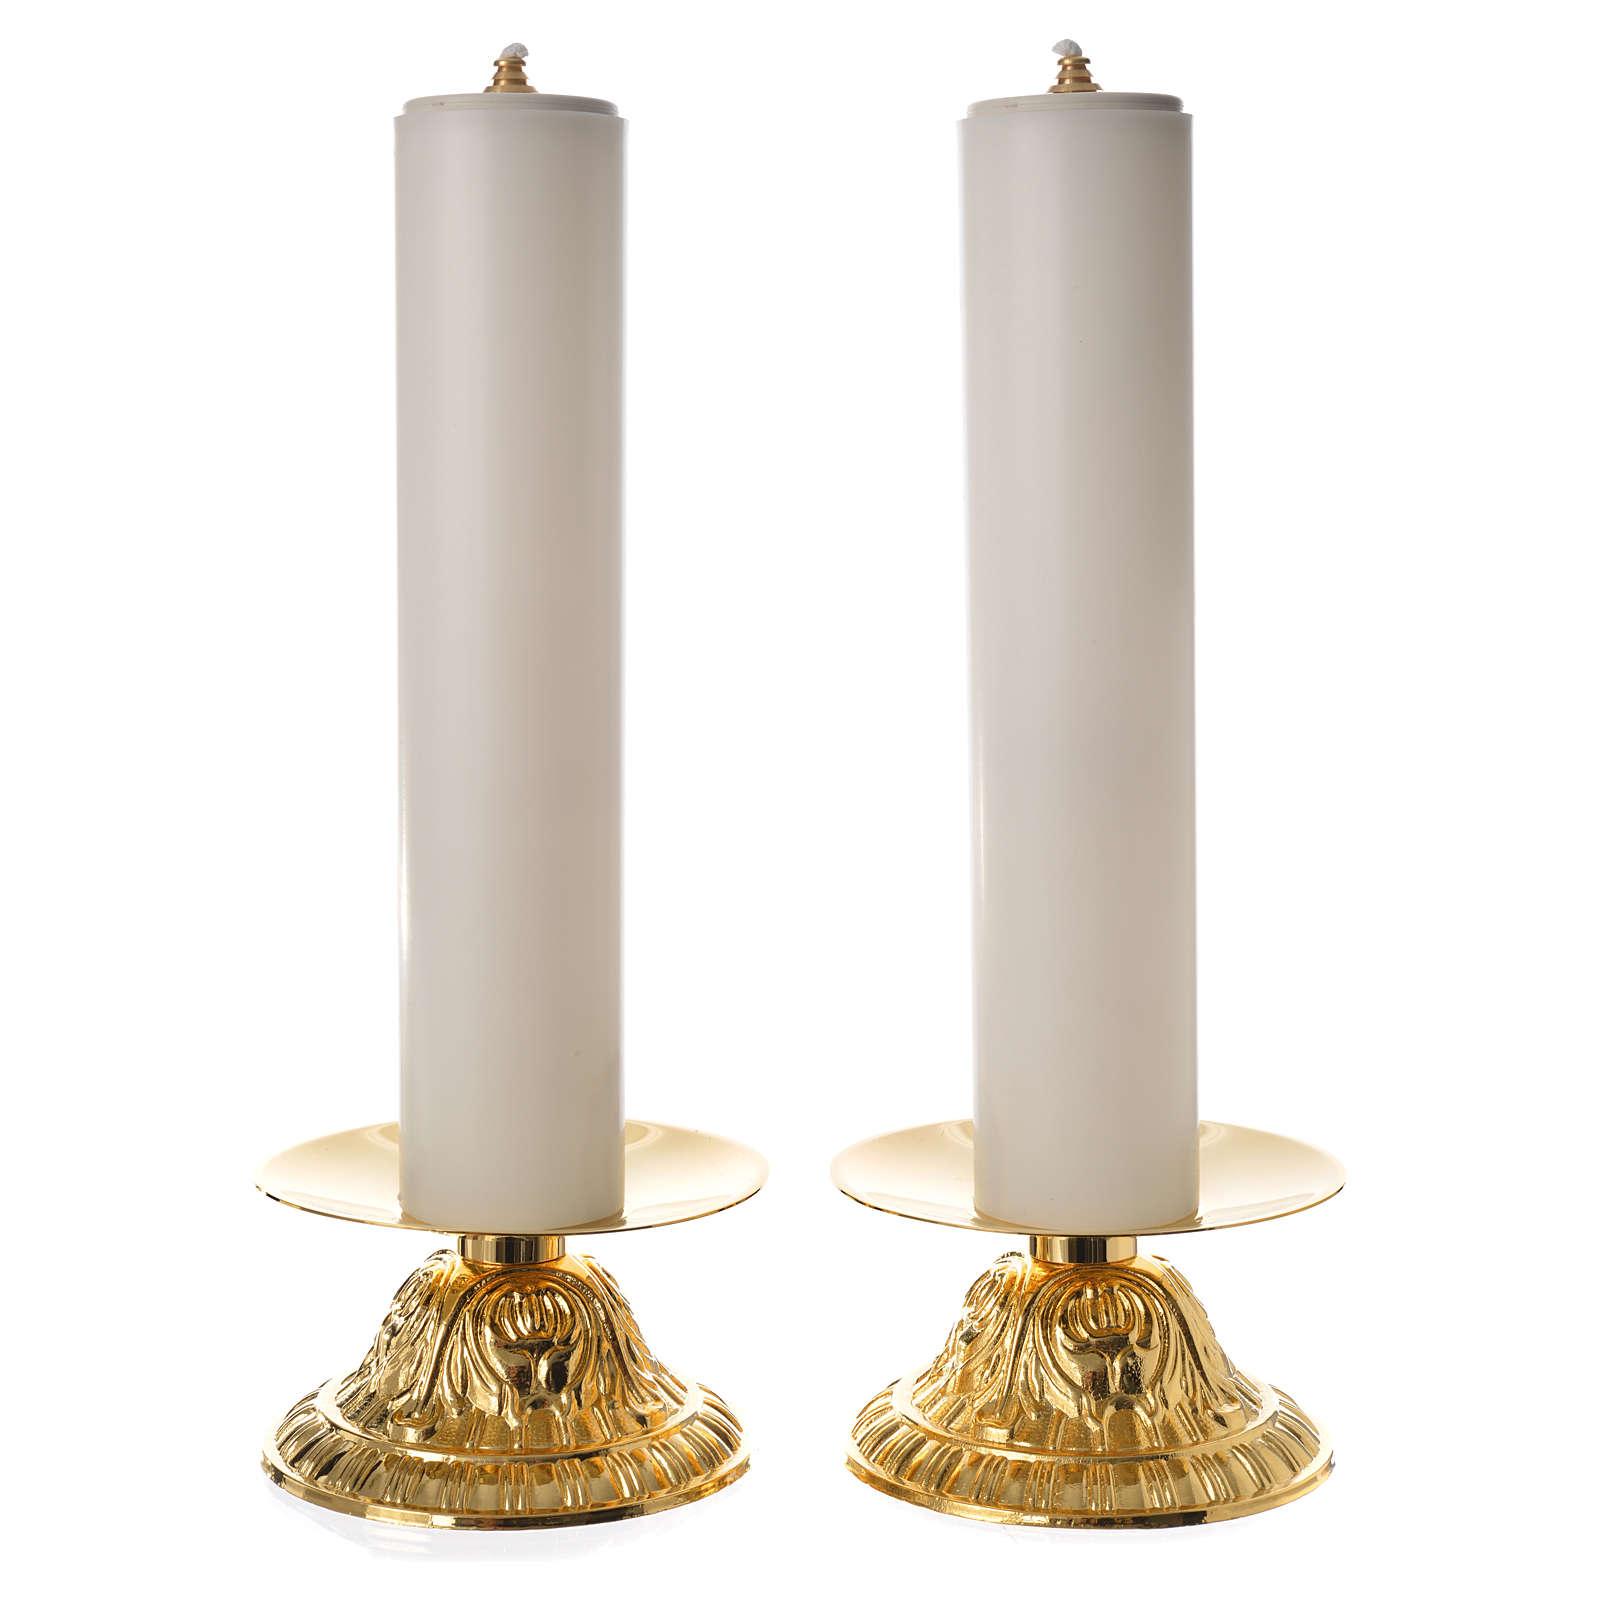 Candelieri con finte candele 2 pz 4